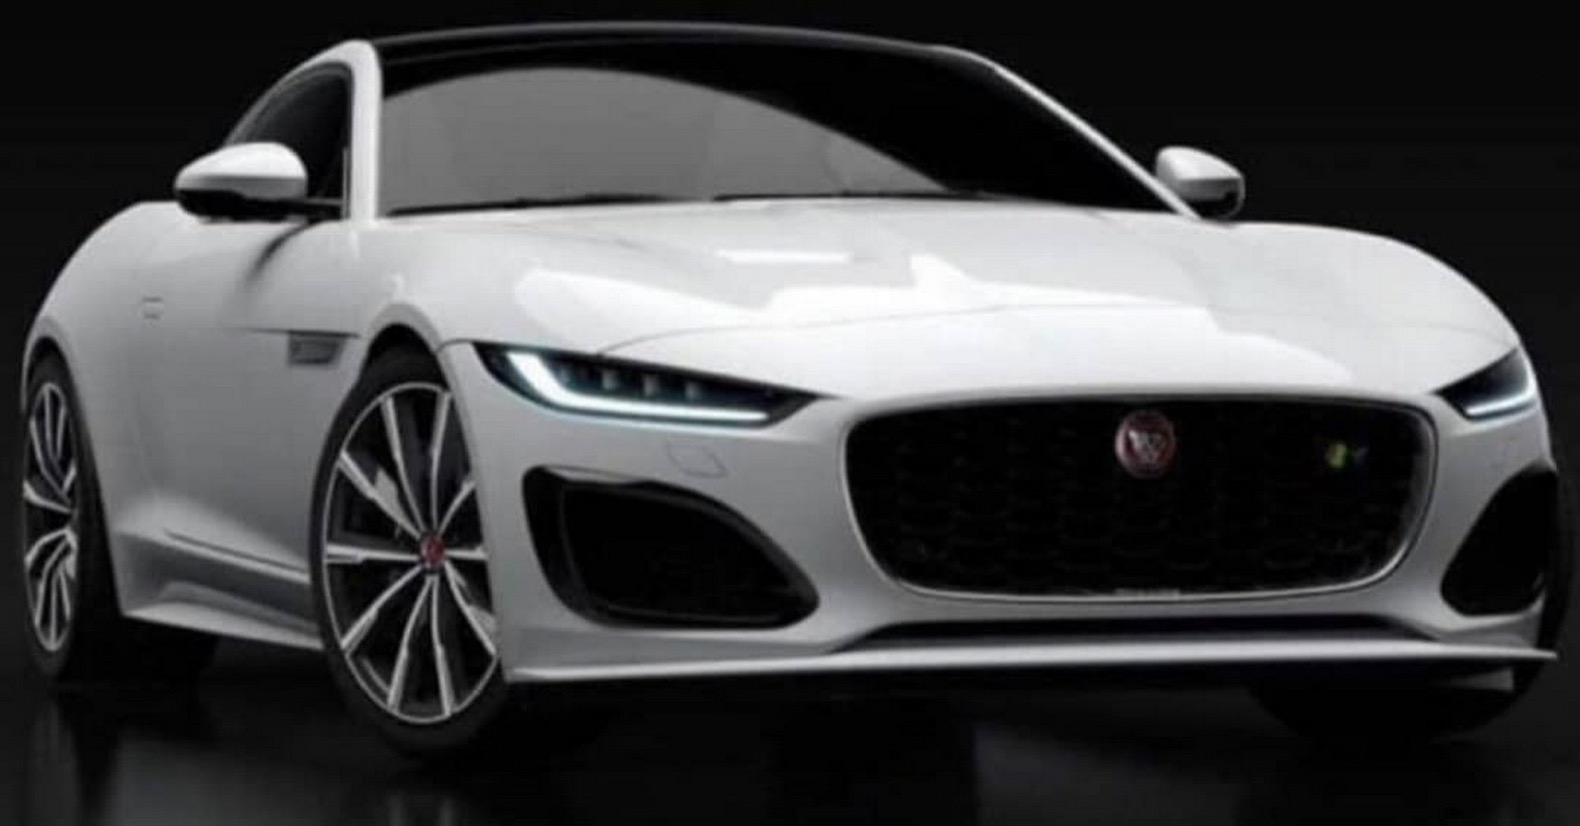 2019 Jaguar F Type Rumors Release Date Redesign >> 2021 Jaguar F Type Leaked The Torque Report